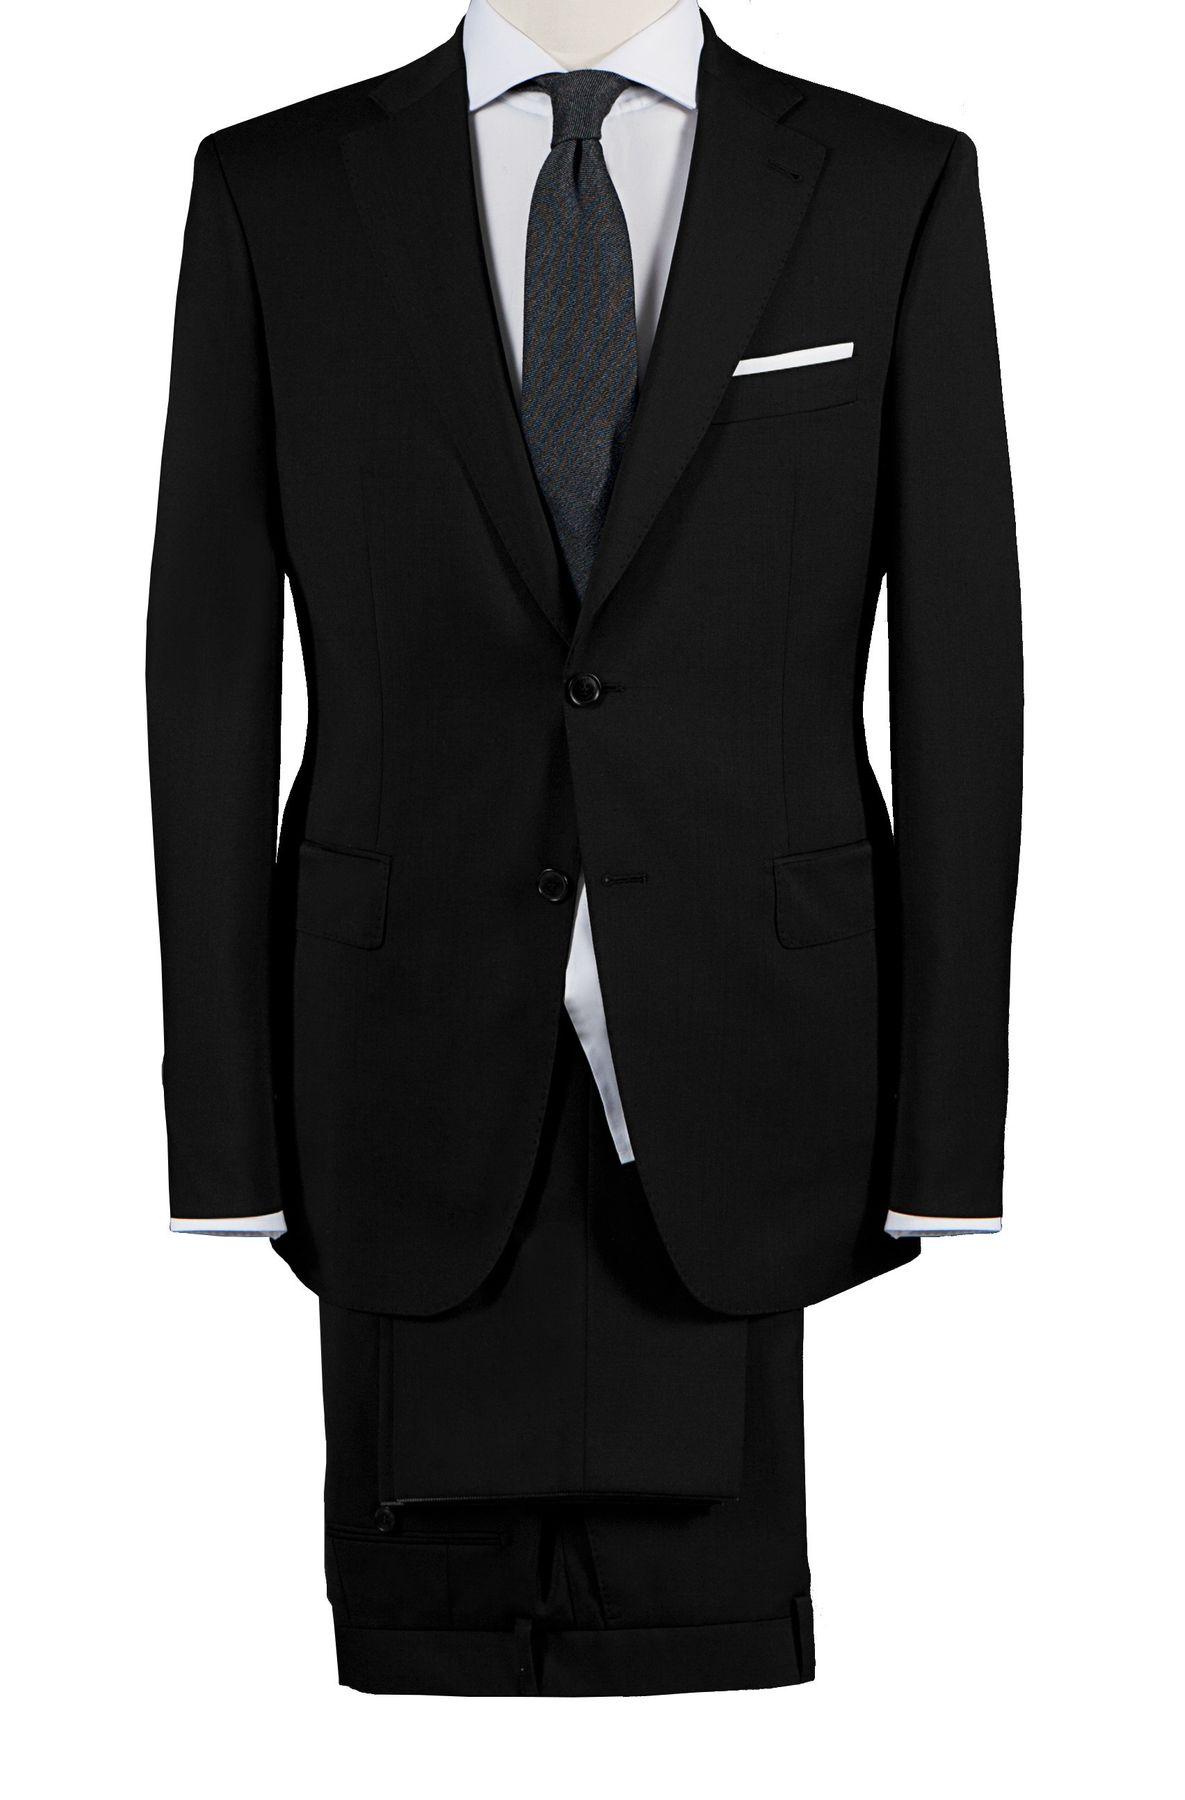 Barutti - Tailored Fit - Herren Baukasten Anzug/Reiseanzug, 900 8009 (Tarso P AMF/Tosco) – Bild 3